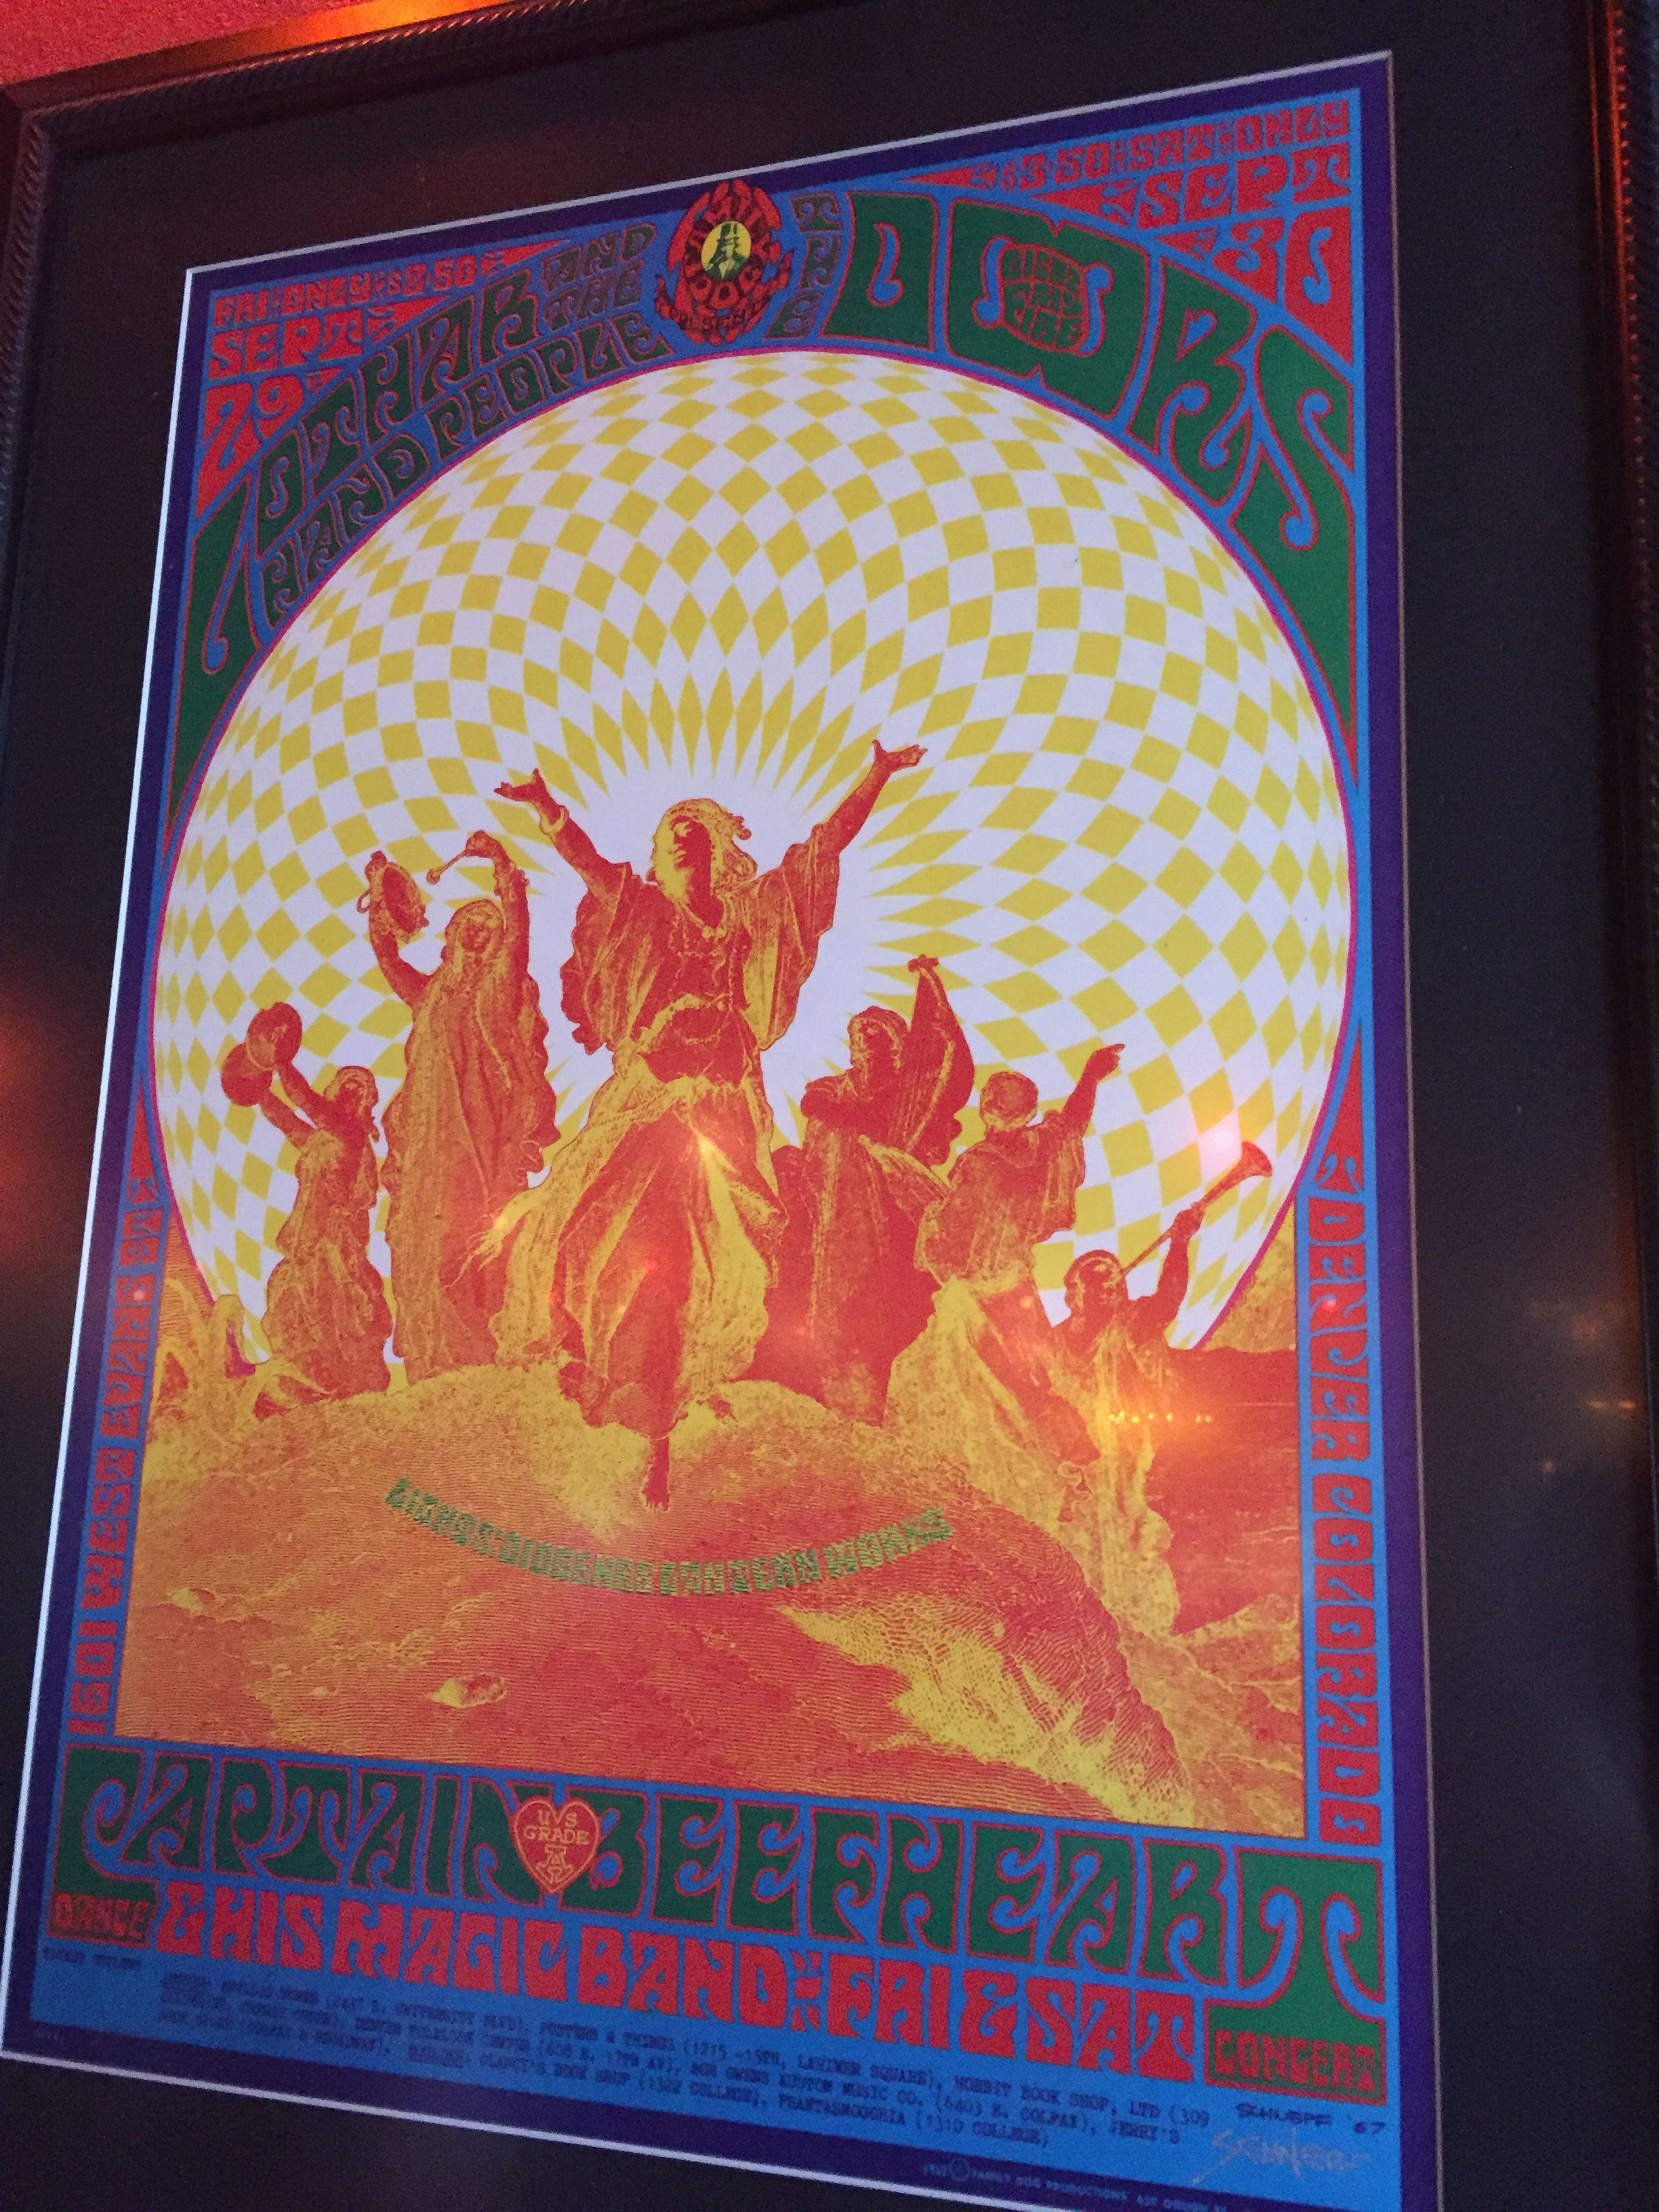 Denver Colorado 1967 concert poster The Doors